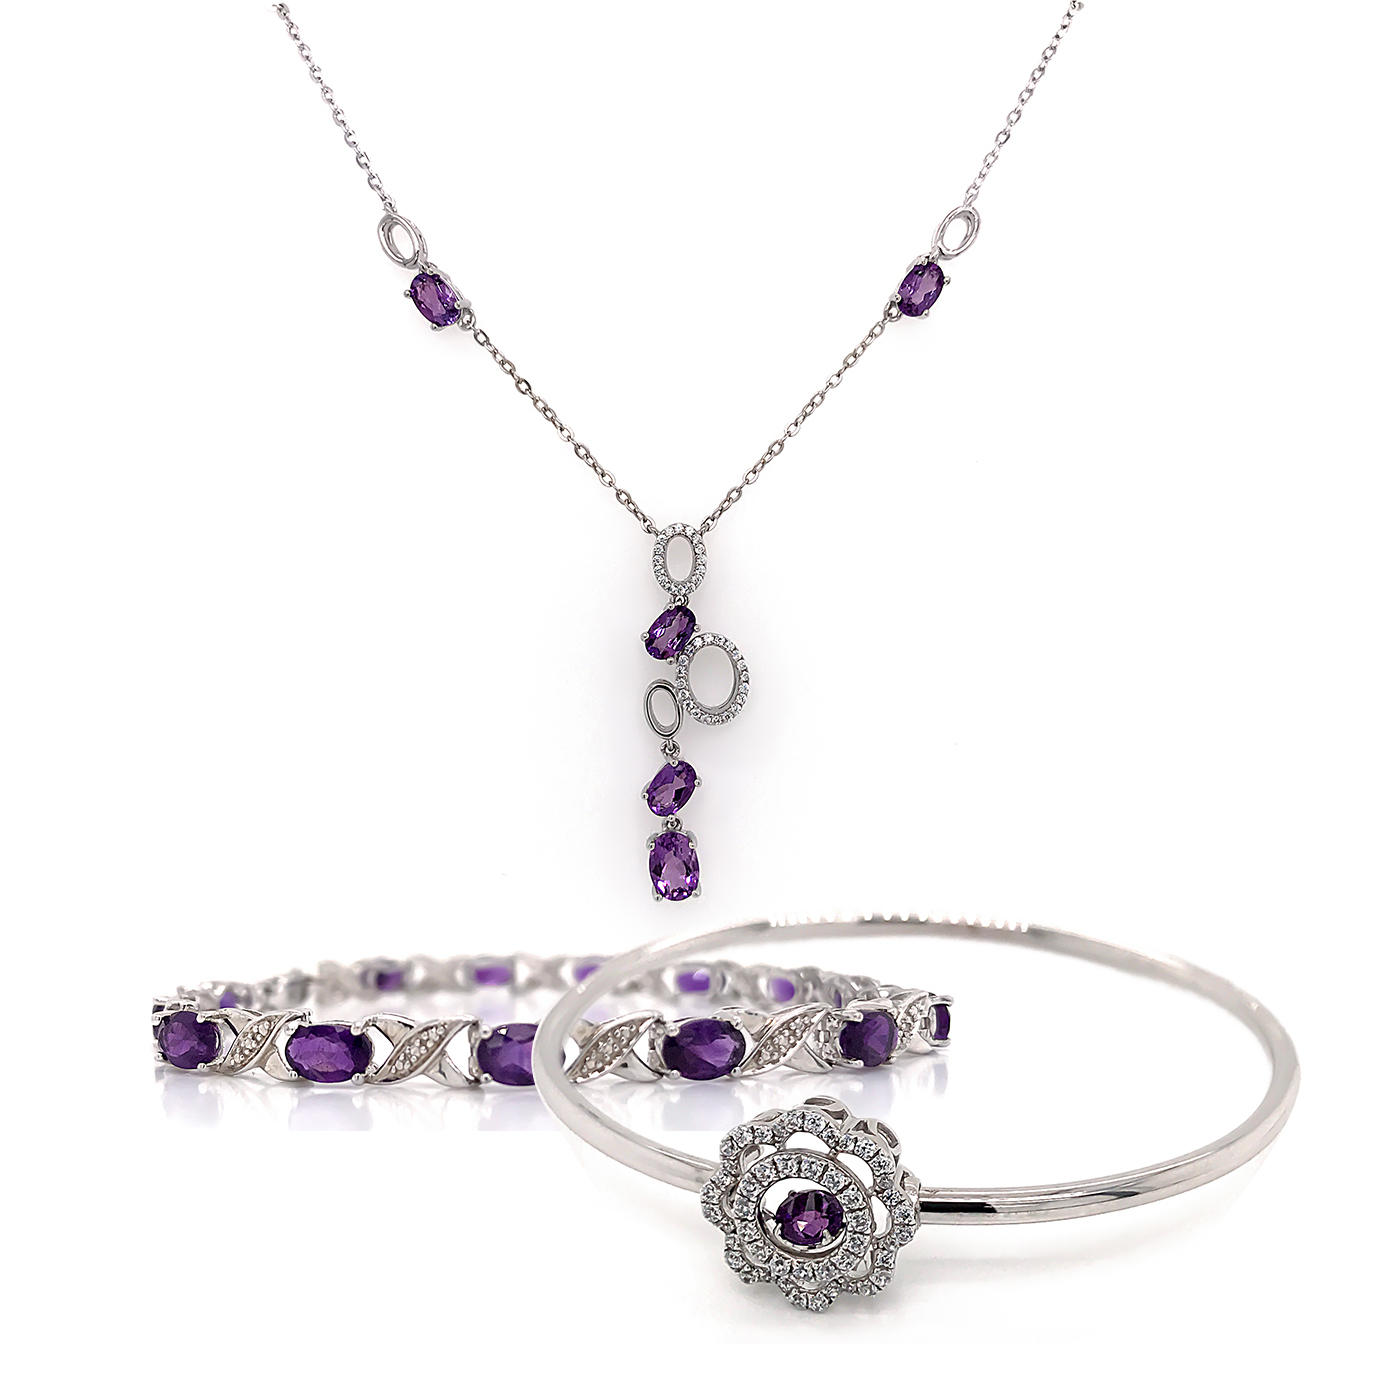 Geometric String Necklace, Amethyst Letter Bracelet Jewelry Set